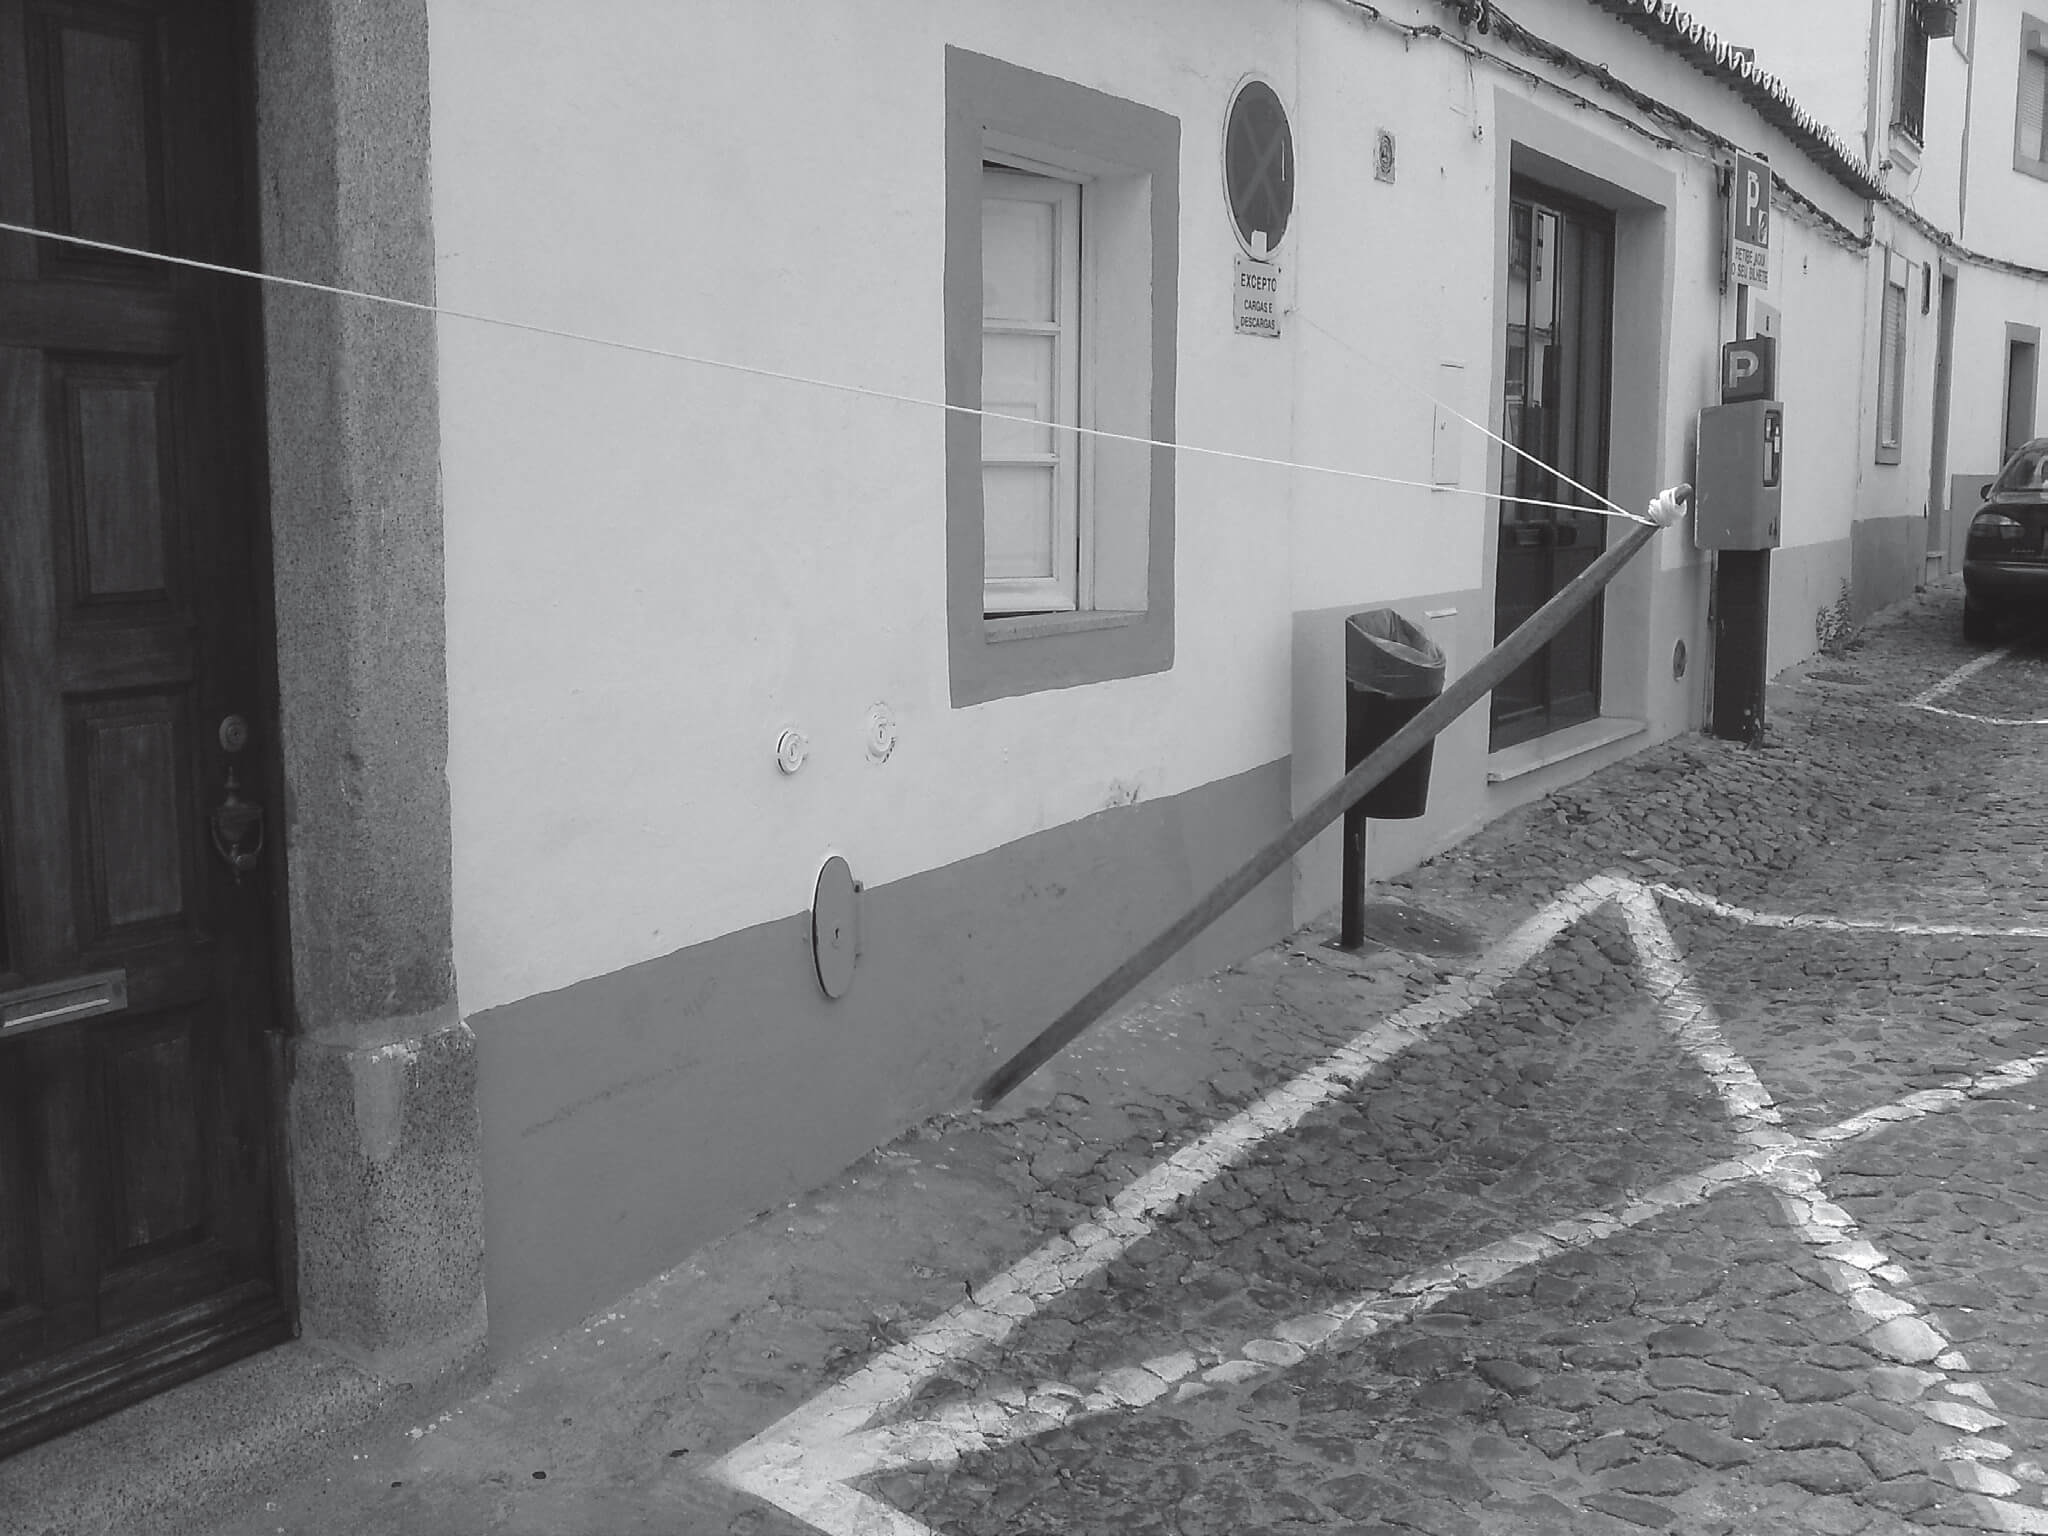 Tendal. Lisboa, 2011. Foto: Tomás Alonso